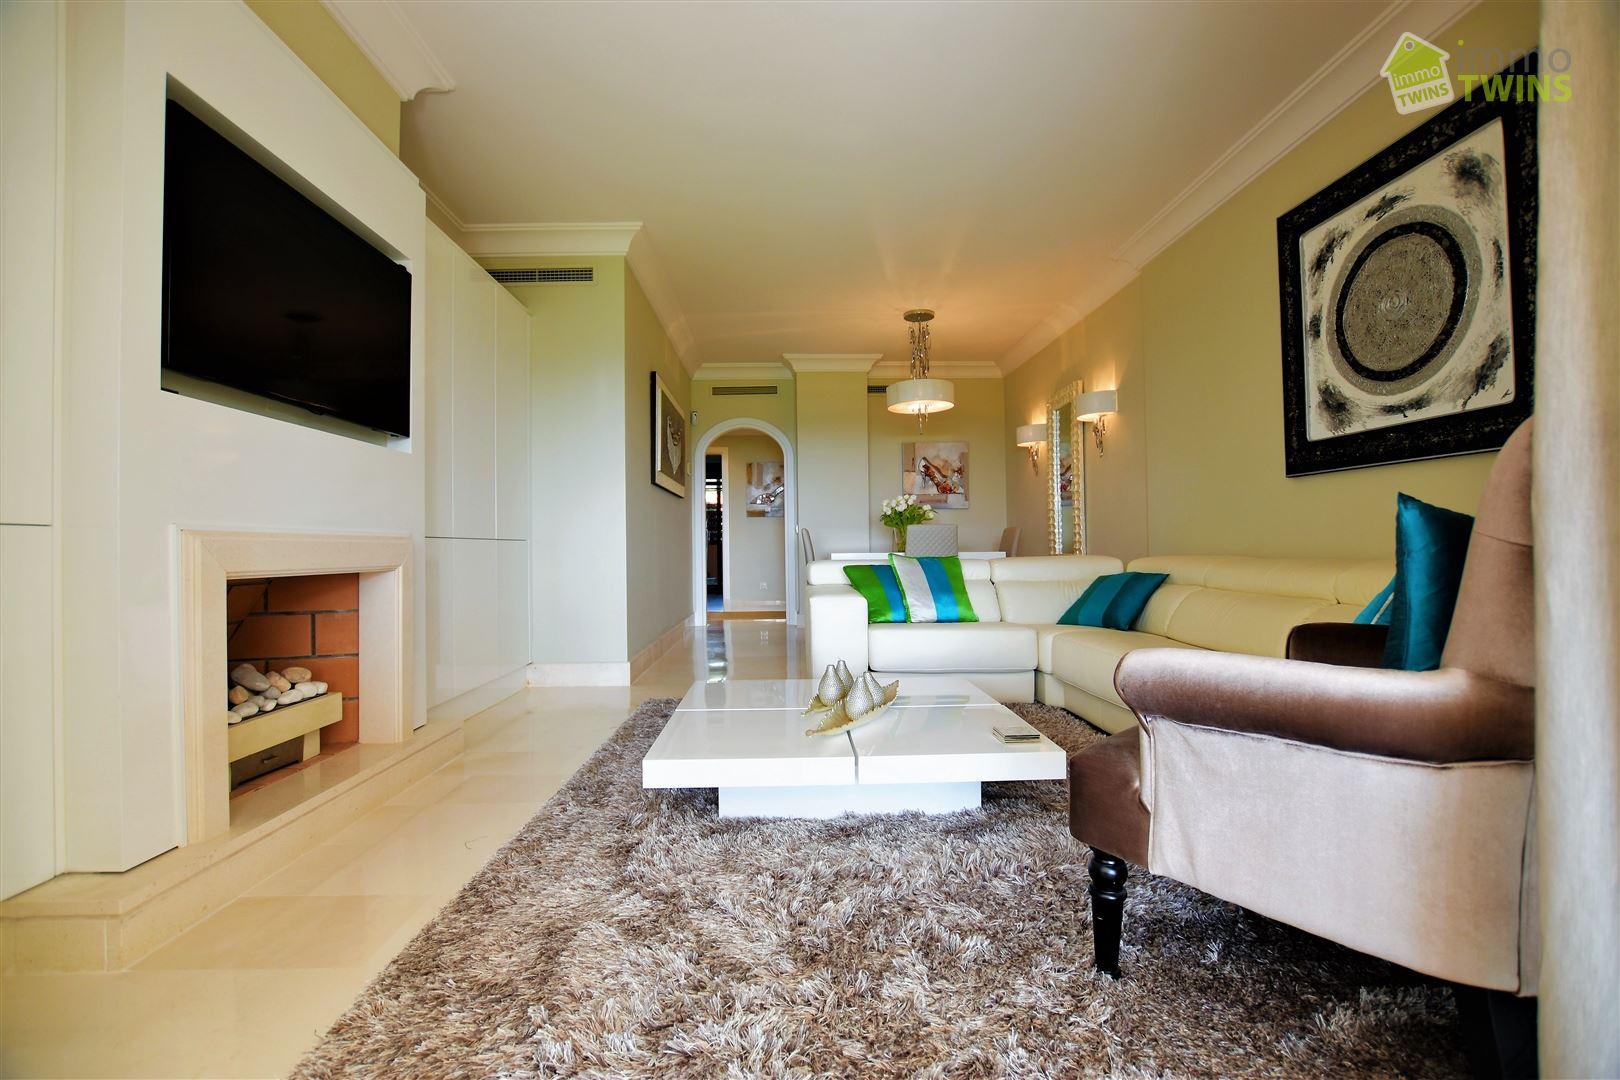 Foto 5 : Appartement te 29679 MARBELLA (Spanje) - Prijs € 485.000